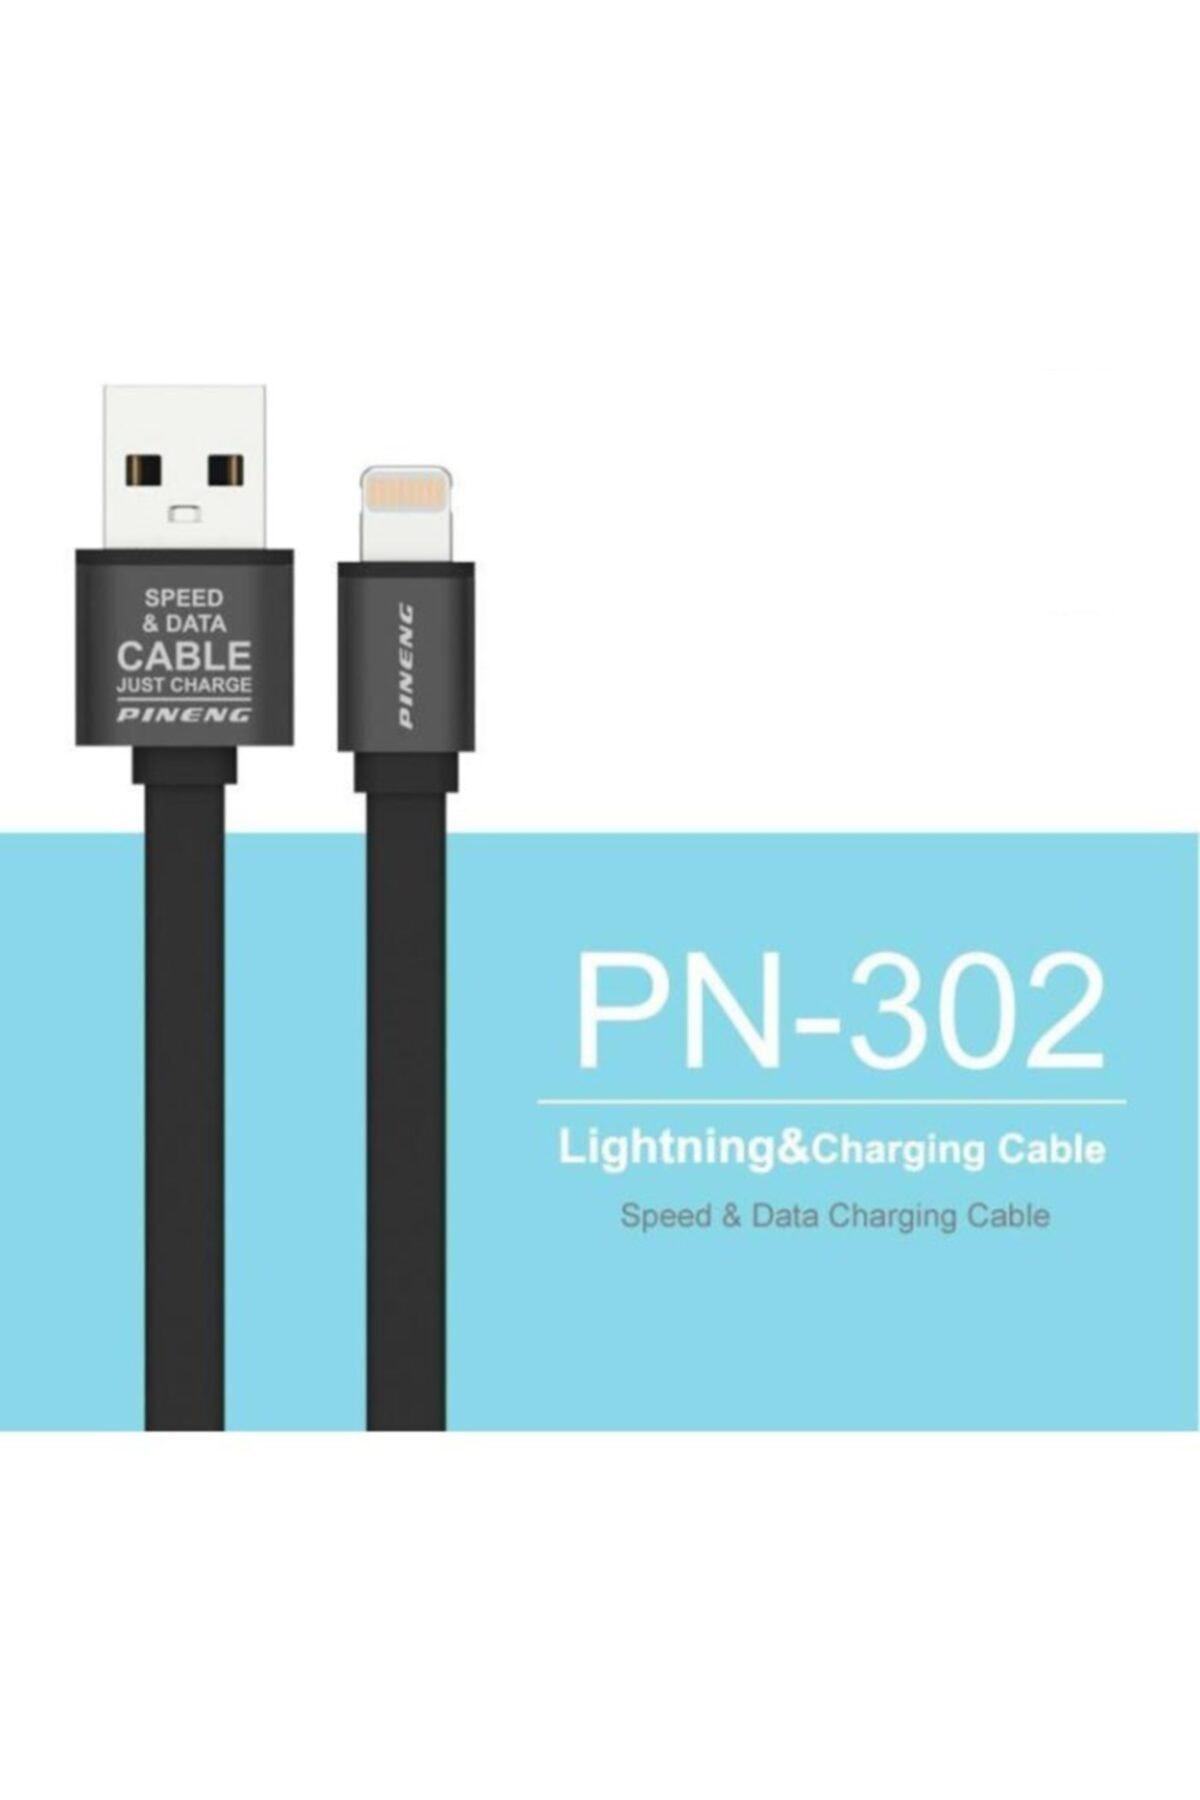 Pineng Data Şarj Kablosu Pn-302 Lightning '' Iphone, X, Xr, Xs,xs Max ''1 Metre Yüksek Hızlı - Beyaz 2